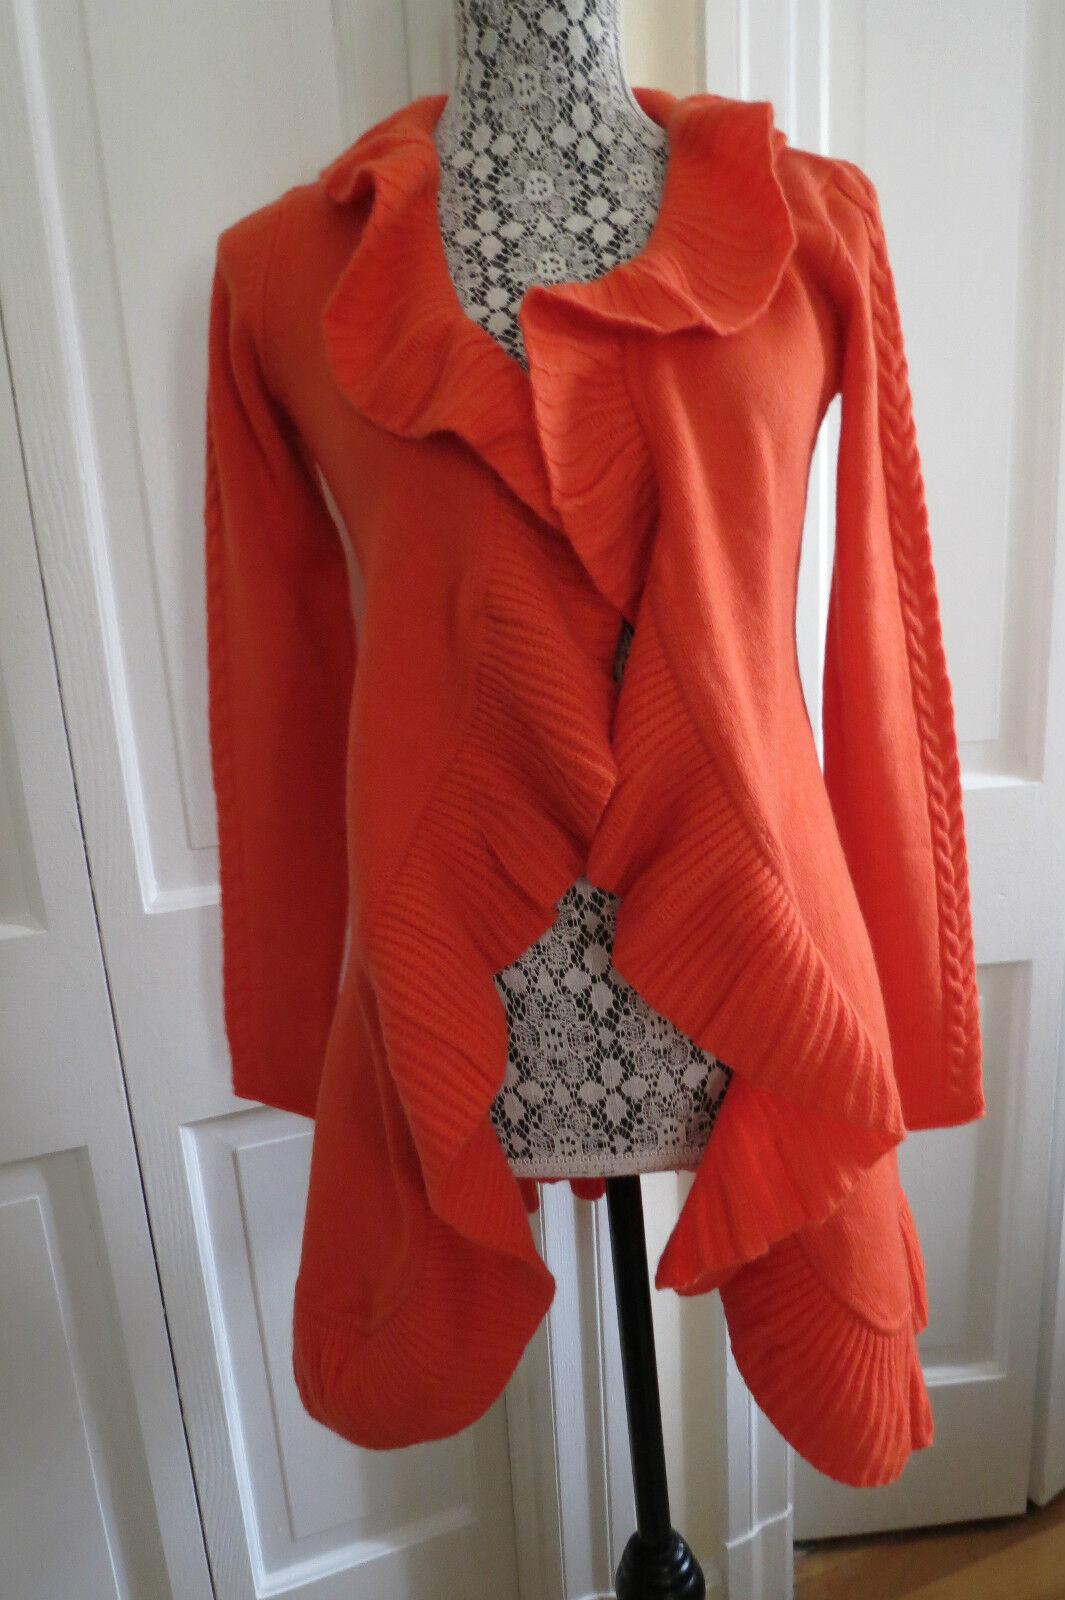 Kier + J Cashmere-Blend orange Ruffled Open Open Open Cardigan - Small NWT -  325 a8d657